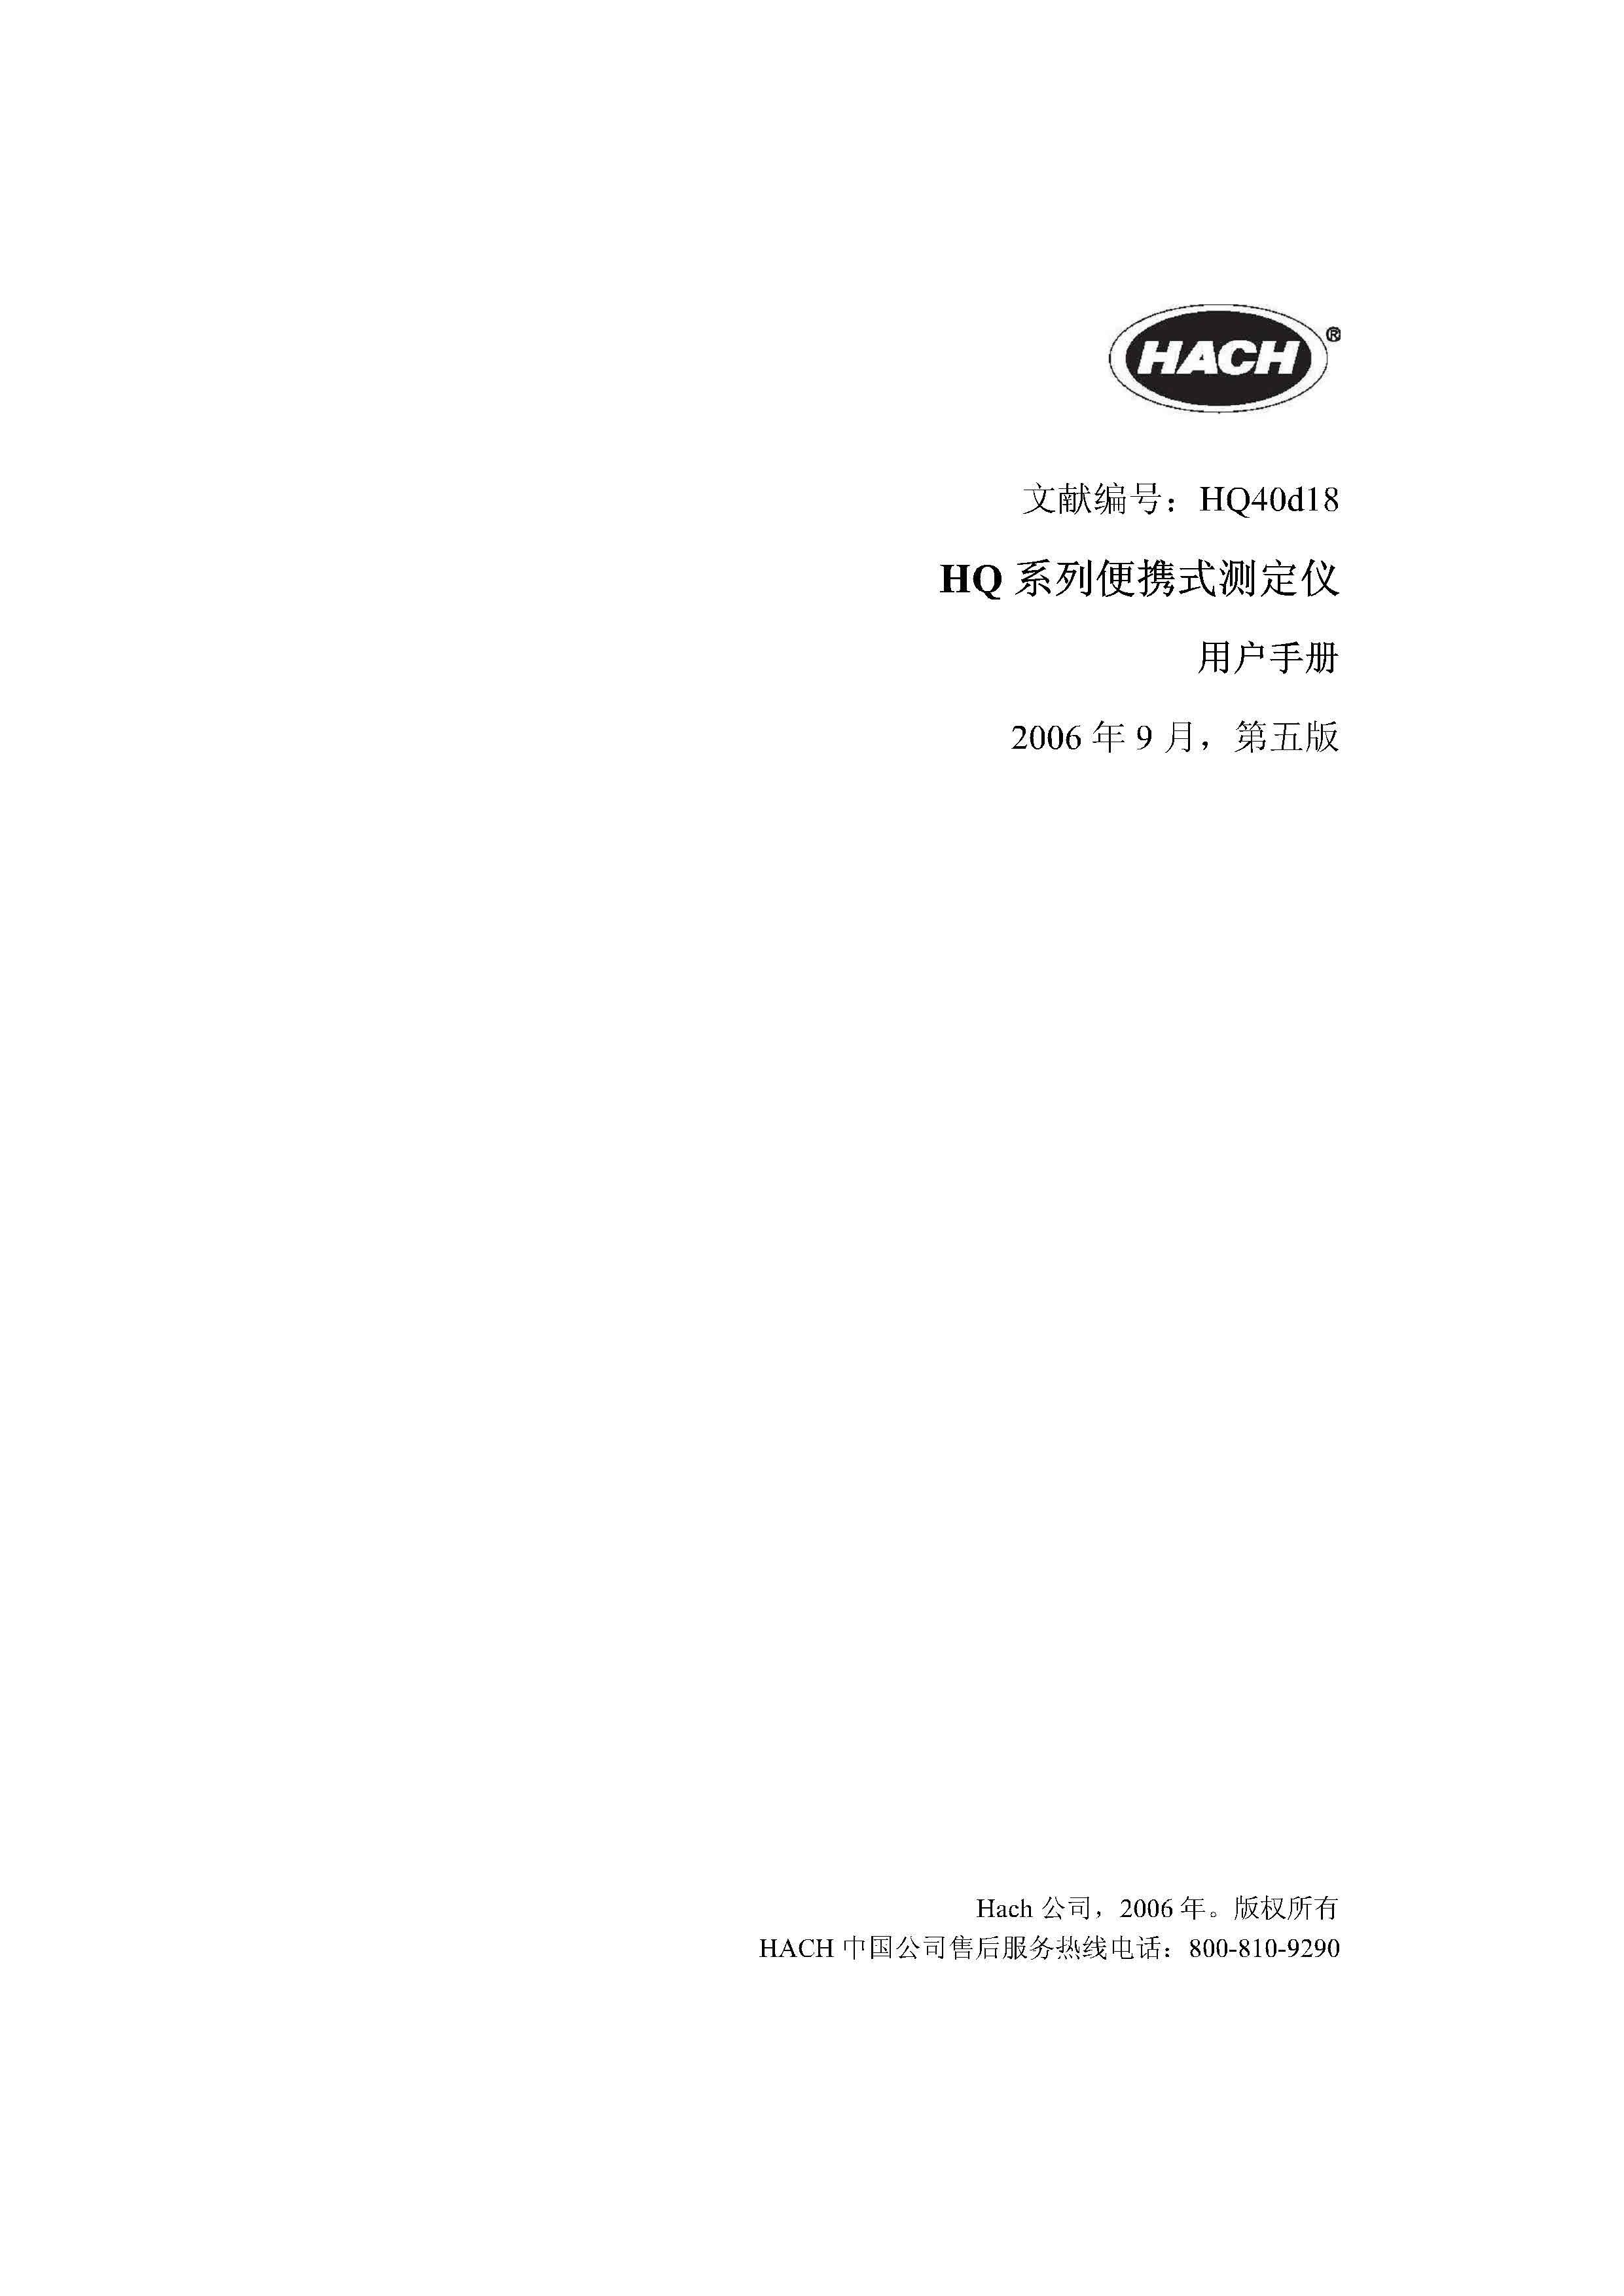 HACH哈希 HQ系列便携式测定仪 中文说明书